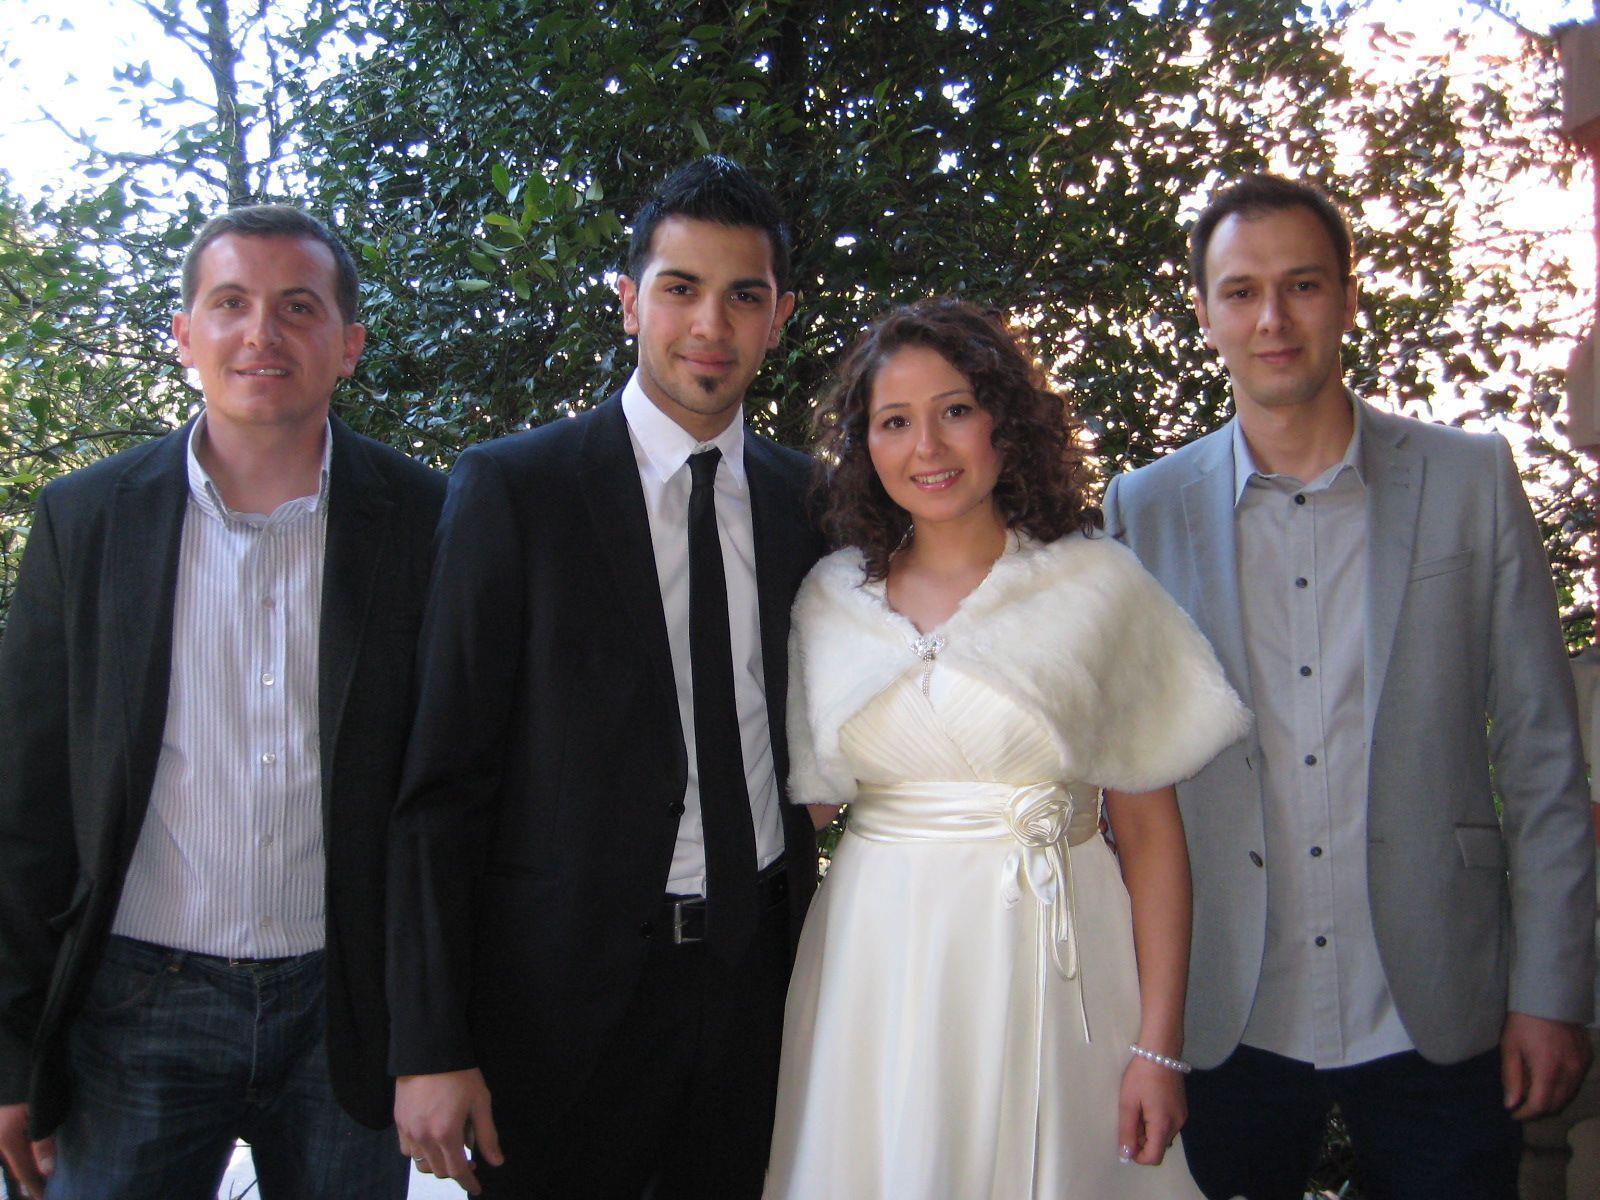 Hülya Öztürk und Cihan Karakoc haben geheiratet.